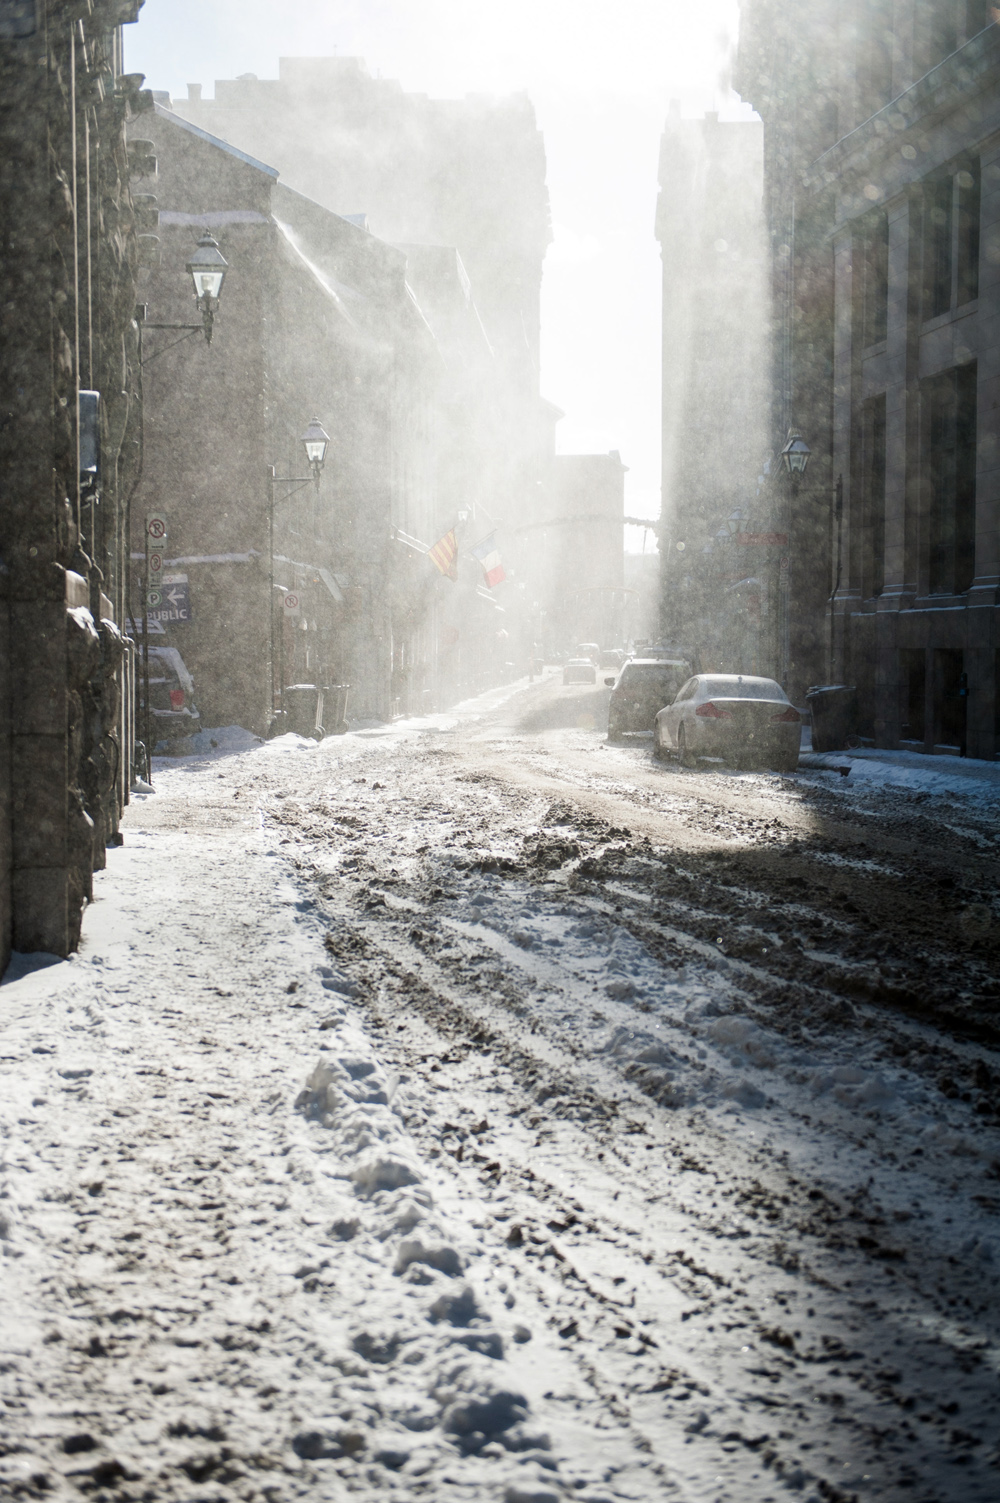 hiver-vieux-1283.jpg